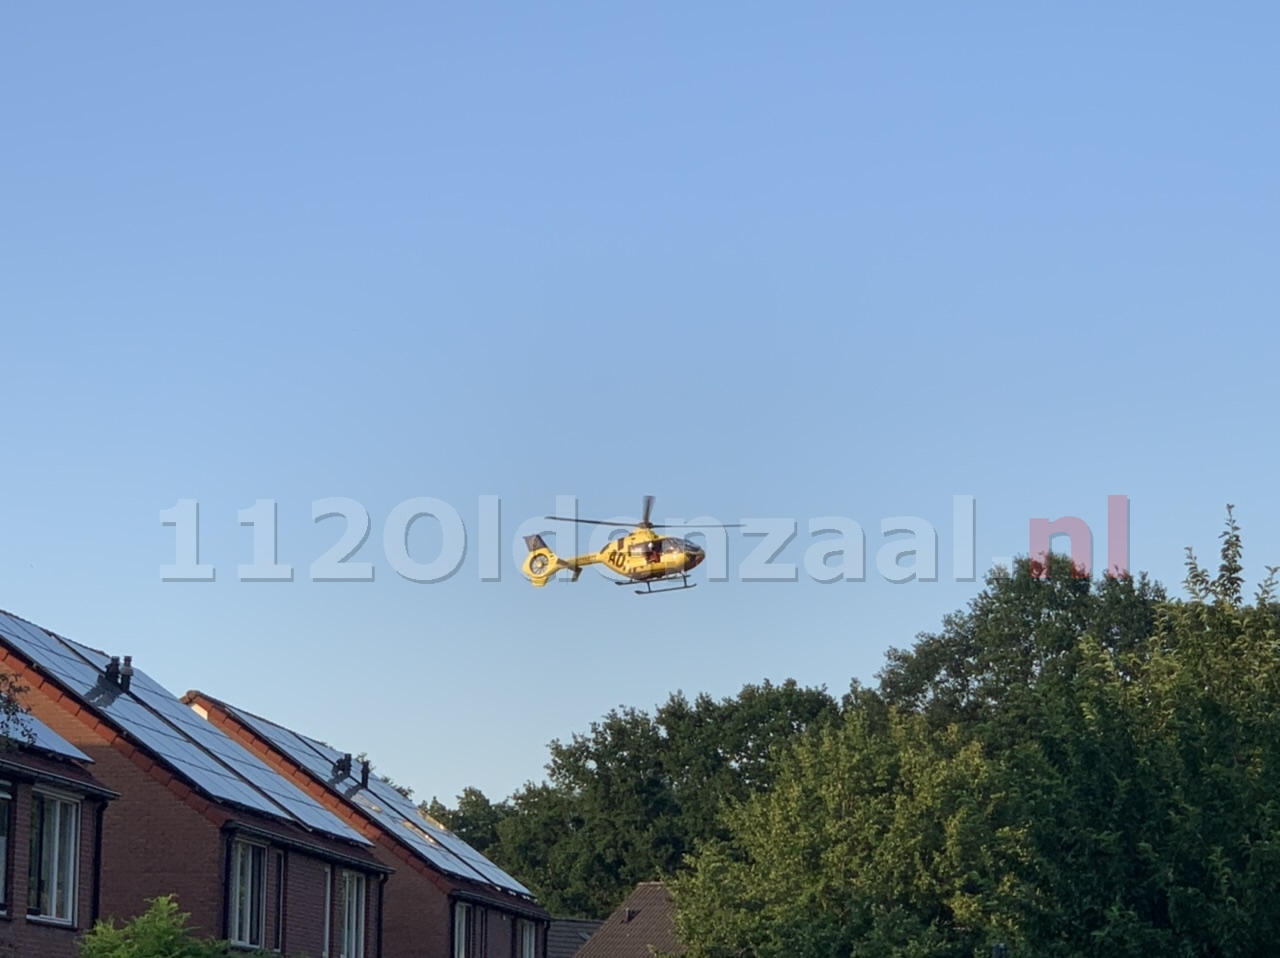 UPDATE: Traumahelikopter ingezet in Oldenzaal